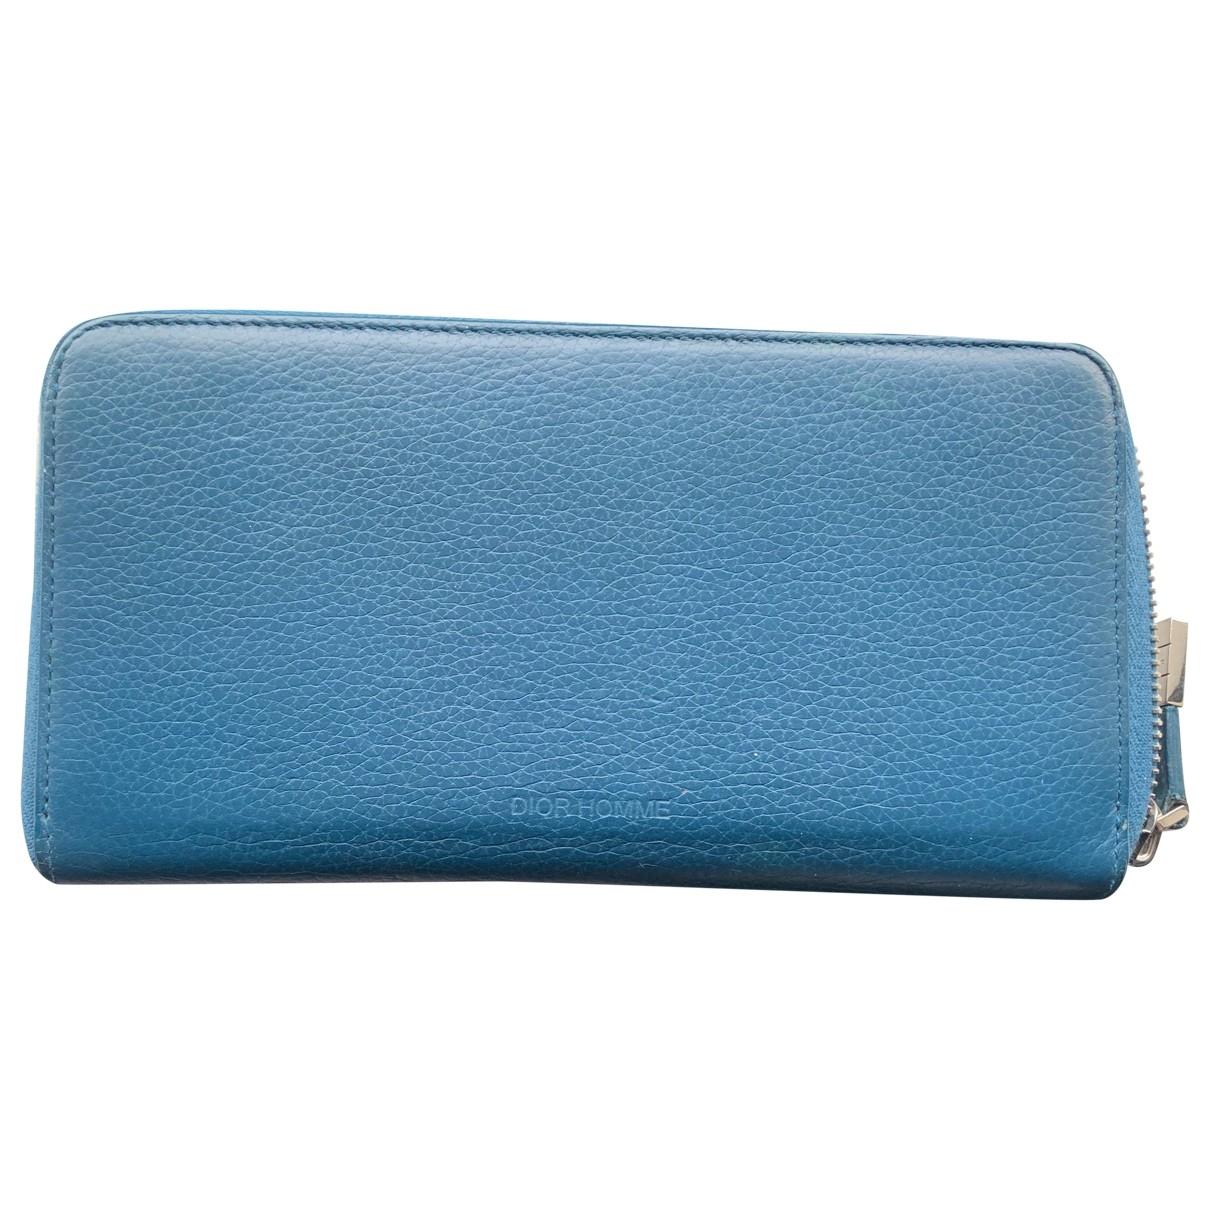 Dior Homme \N Blue Leather Small bag, wallet & cases for Men \N